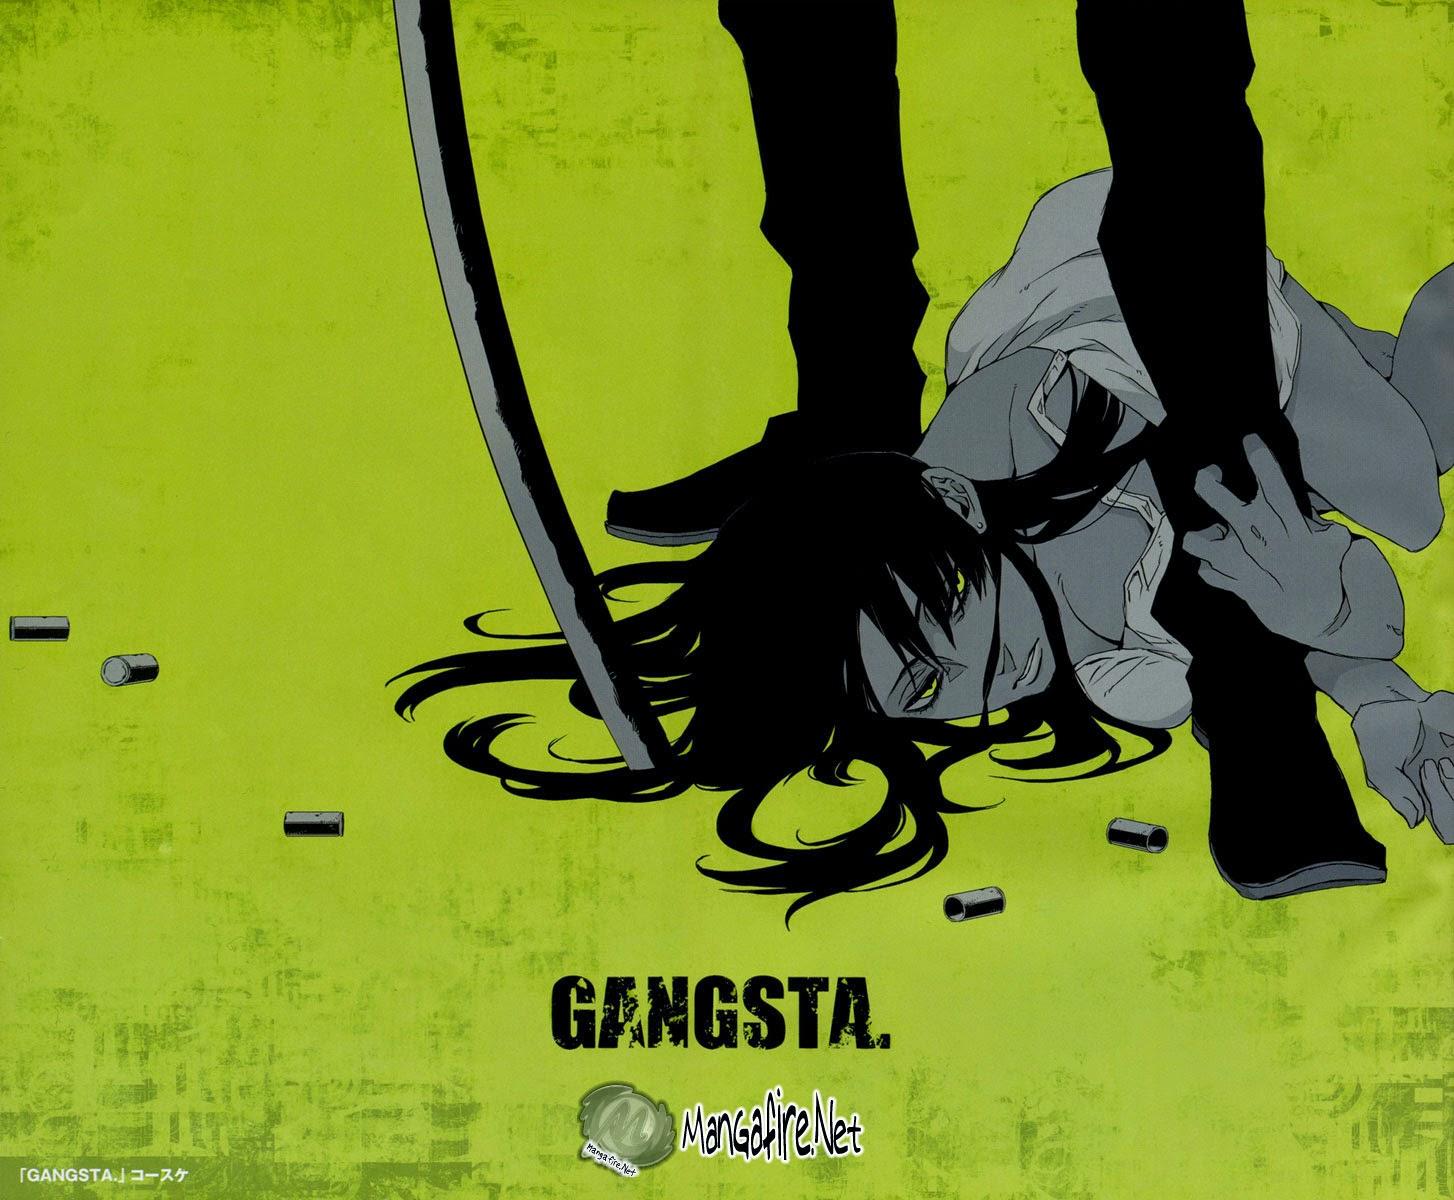 Dilarang COPAS - situs resmi  - Komik gangsta 001 - chapter 1 2 Indonesia gangsta 001 - chapter 1 Terbaru 3|Baca Manga Komik Indonesia|